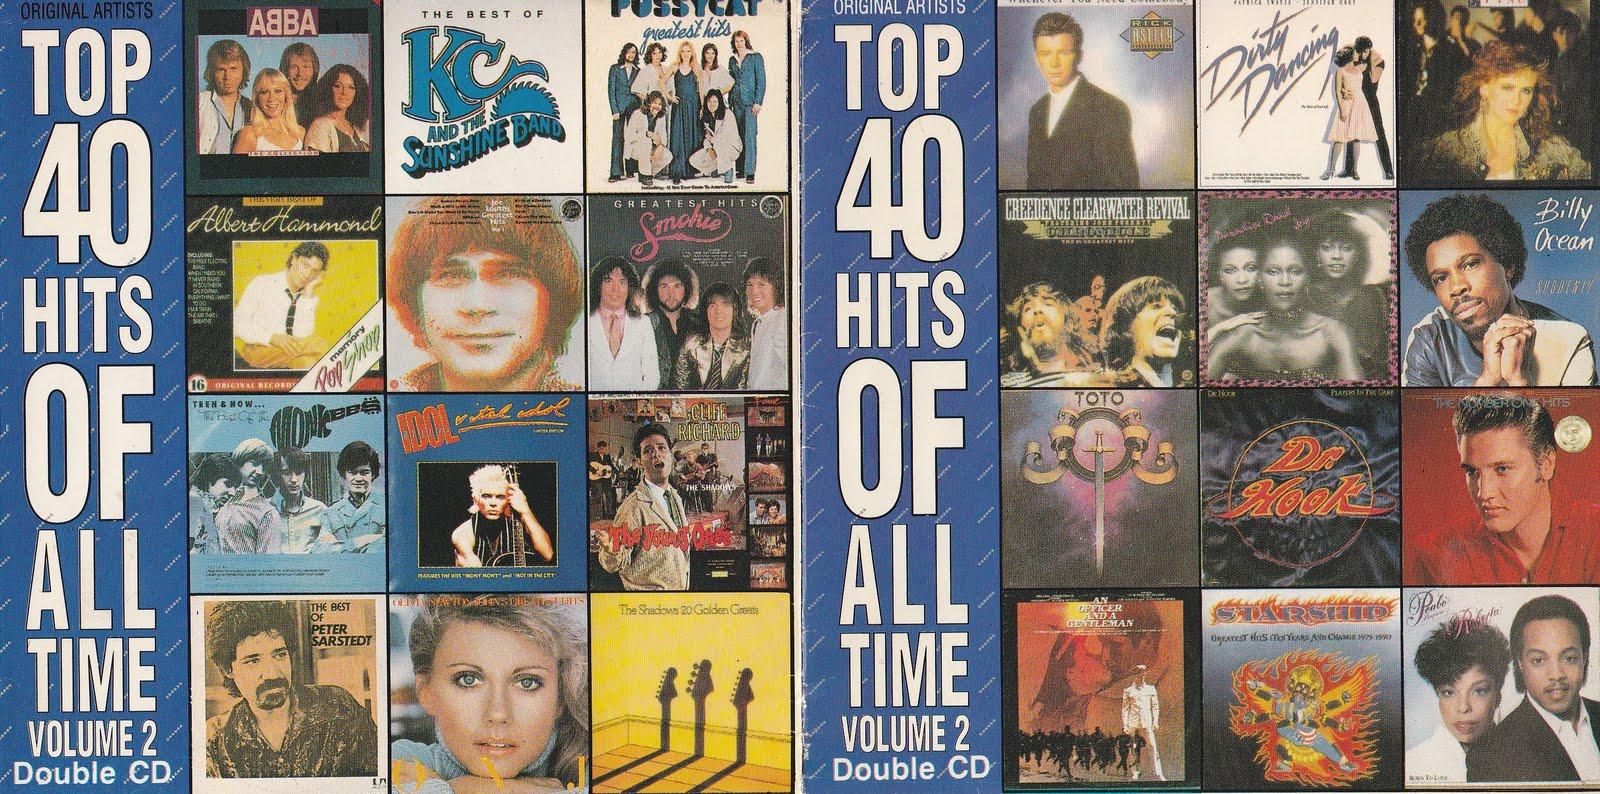 retro disco hi nrg va top 40 hits of all time volume 2 cd set various artists 70 39 s 80 39 s 90 39 s. Black Bedroom Furniture Sets. Home Design Ideas